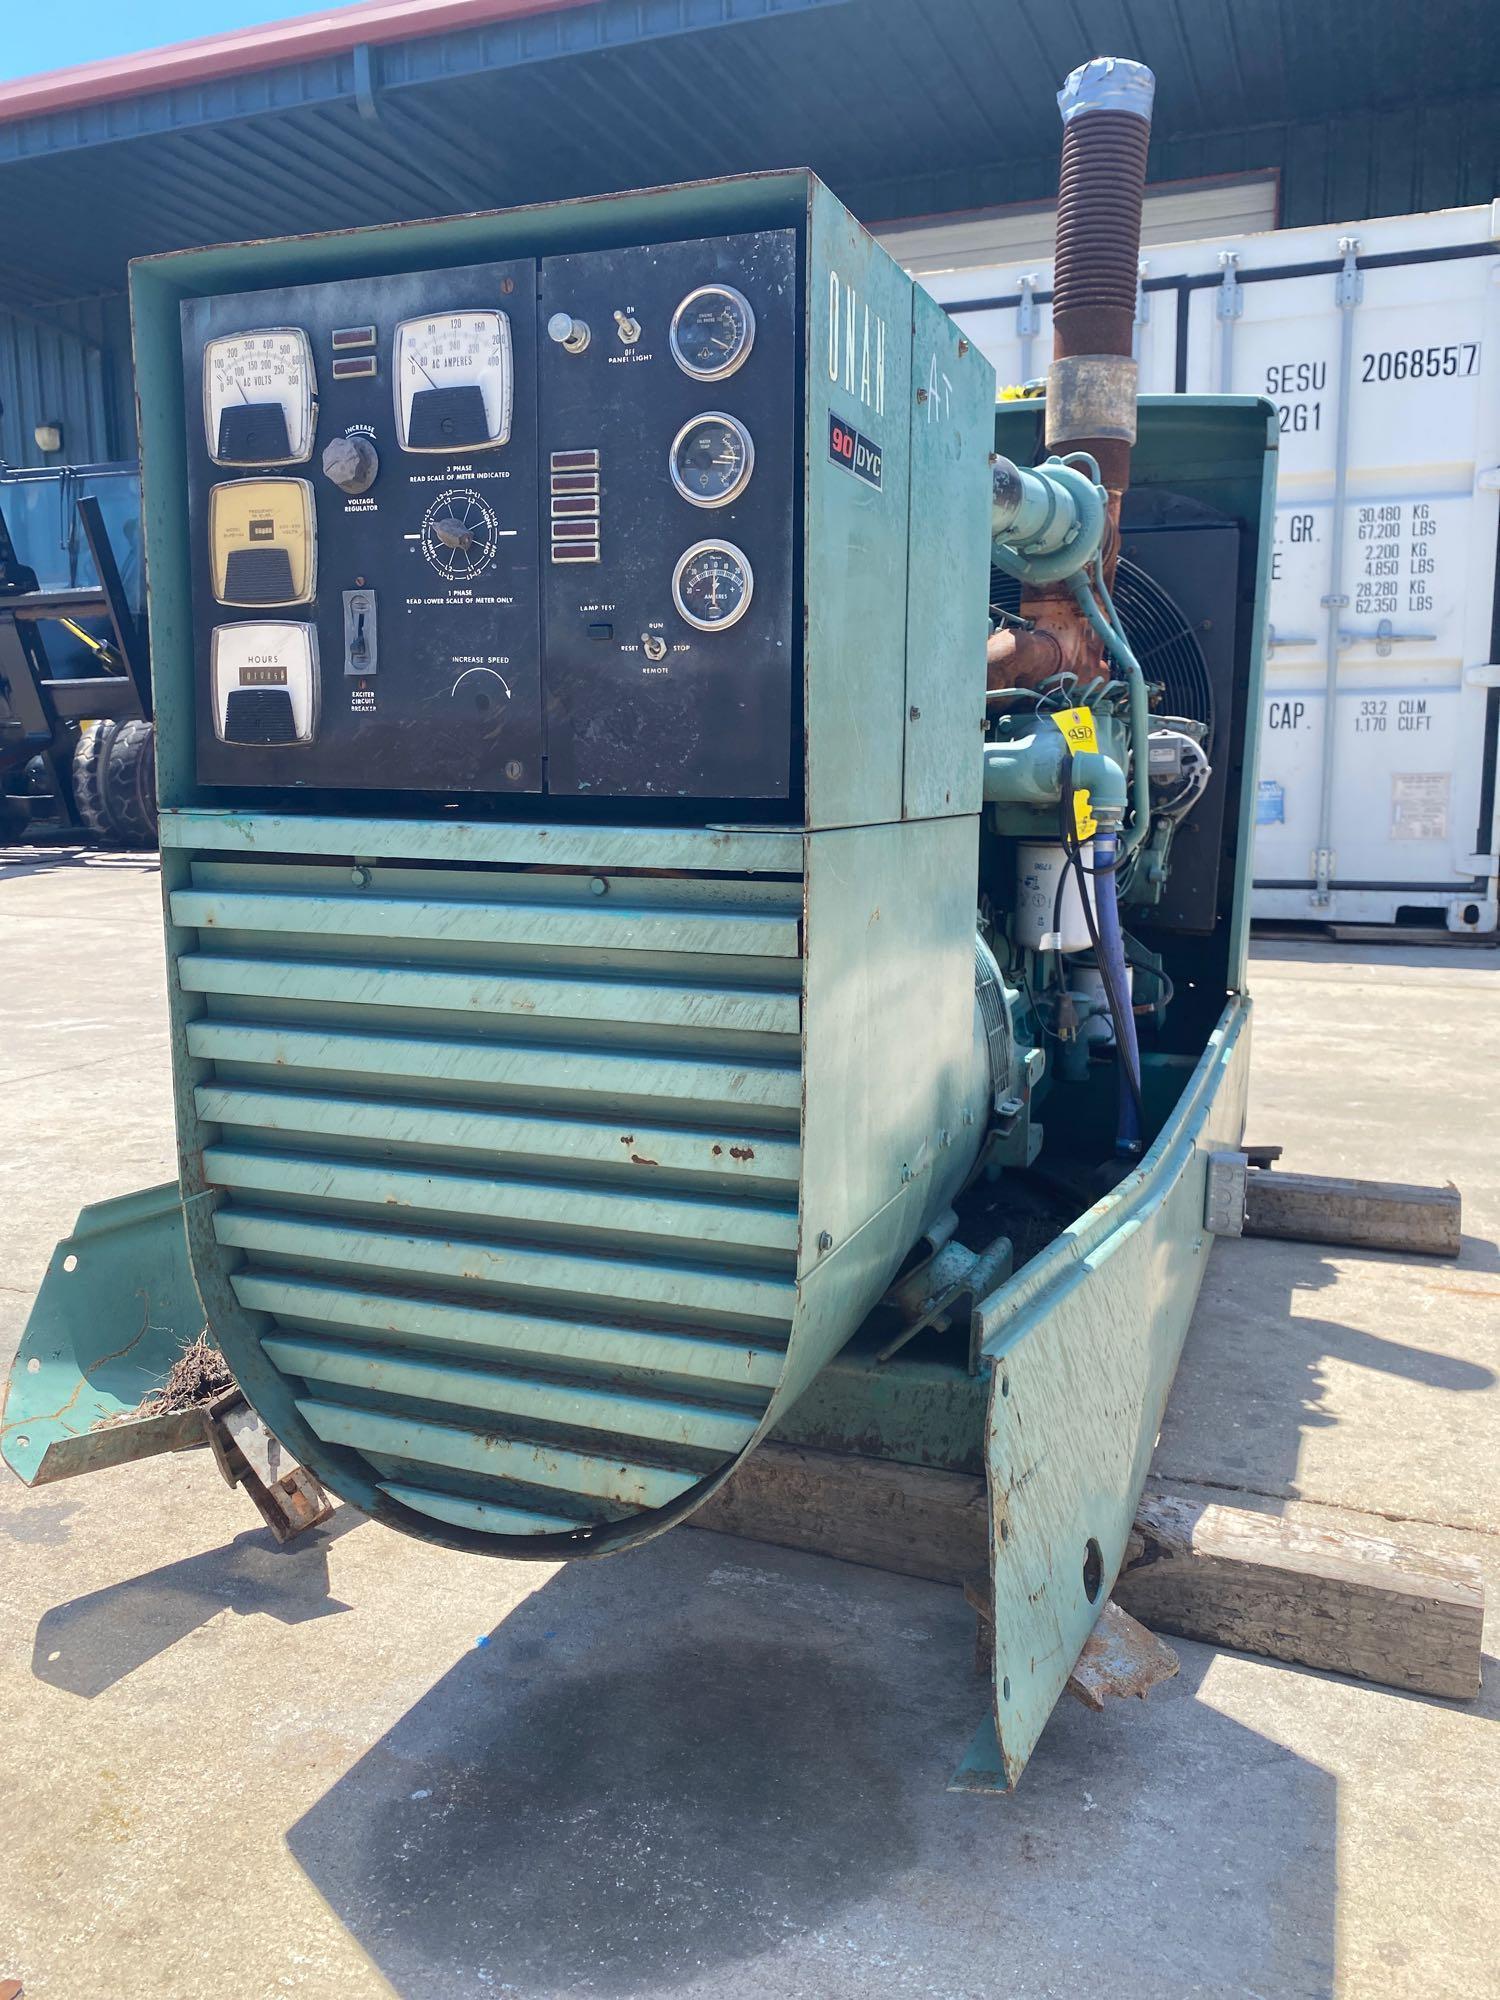 ONAN 90 DYC GENERATOR, 90 KW, 112KVA, 1085 HOURS SHOWING - Image 3 of 11